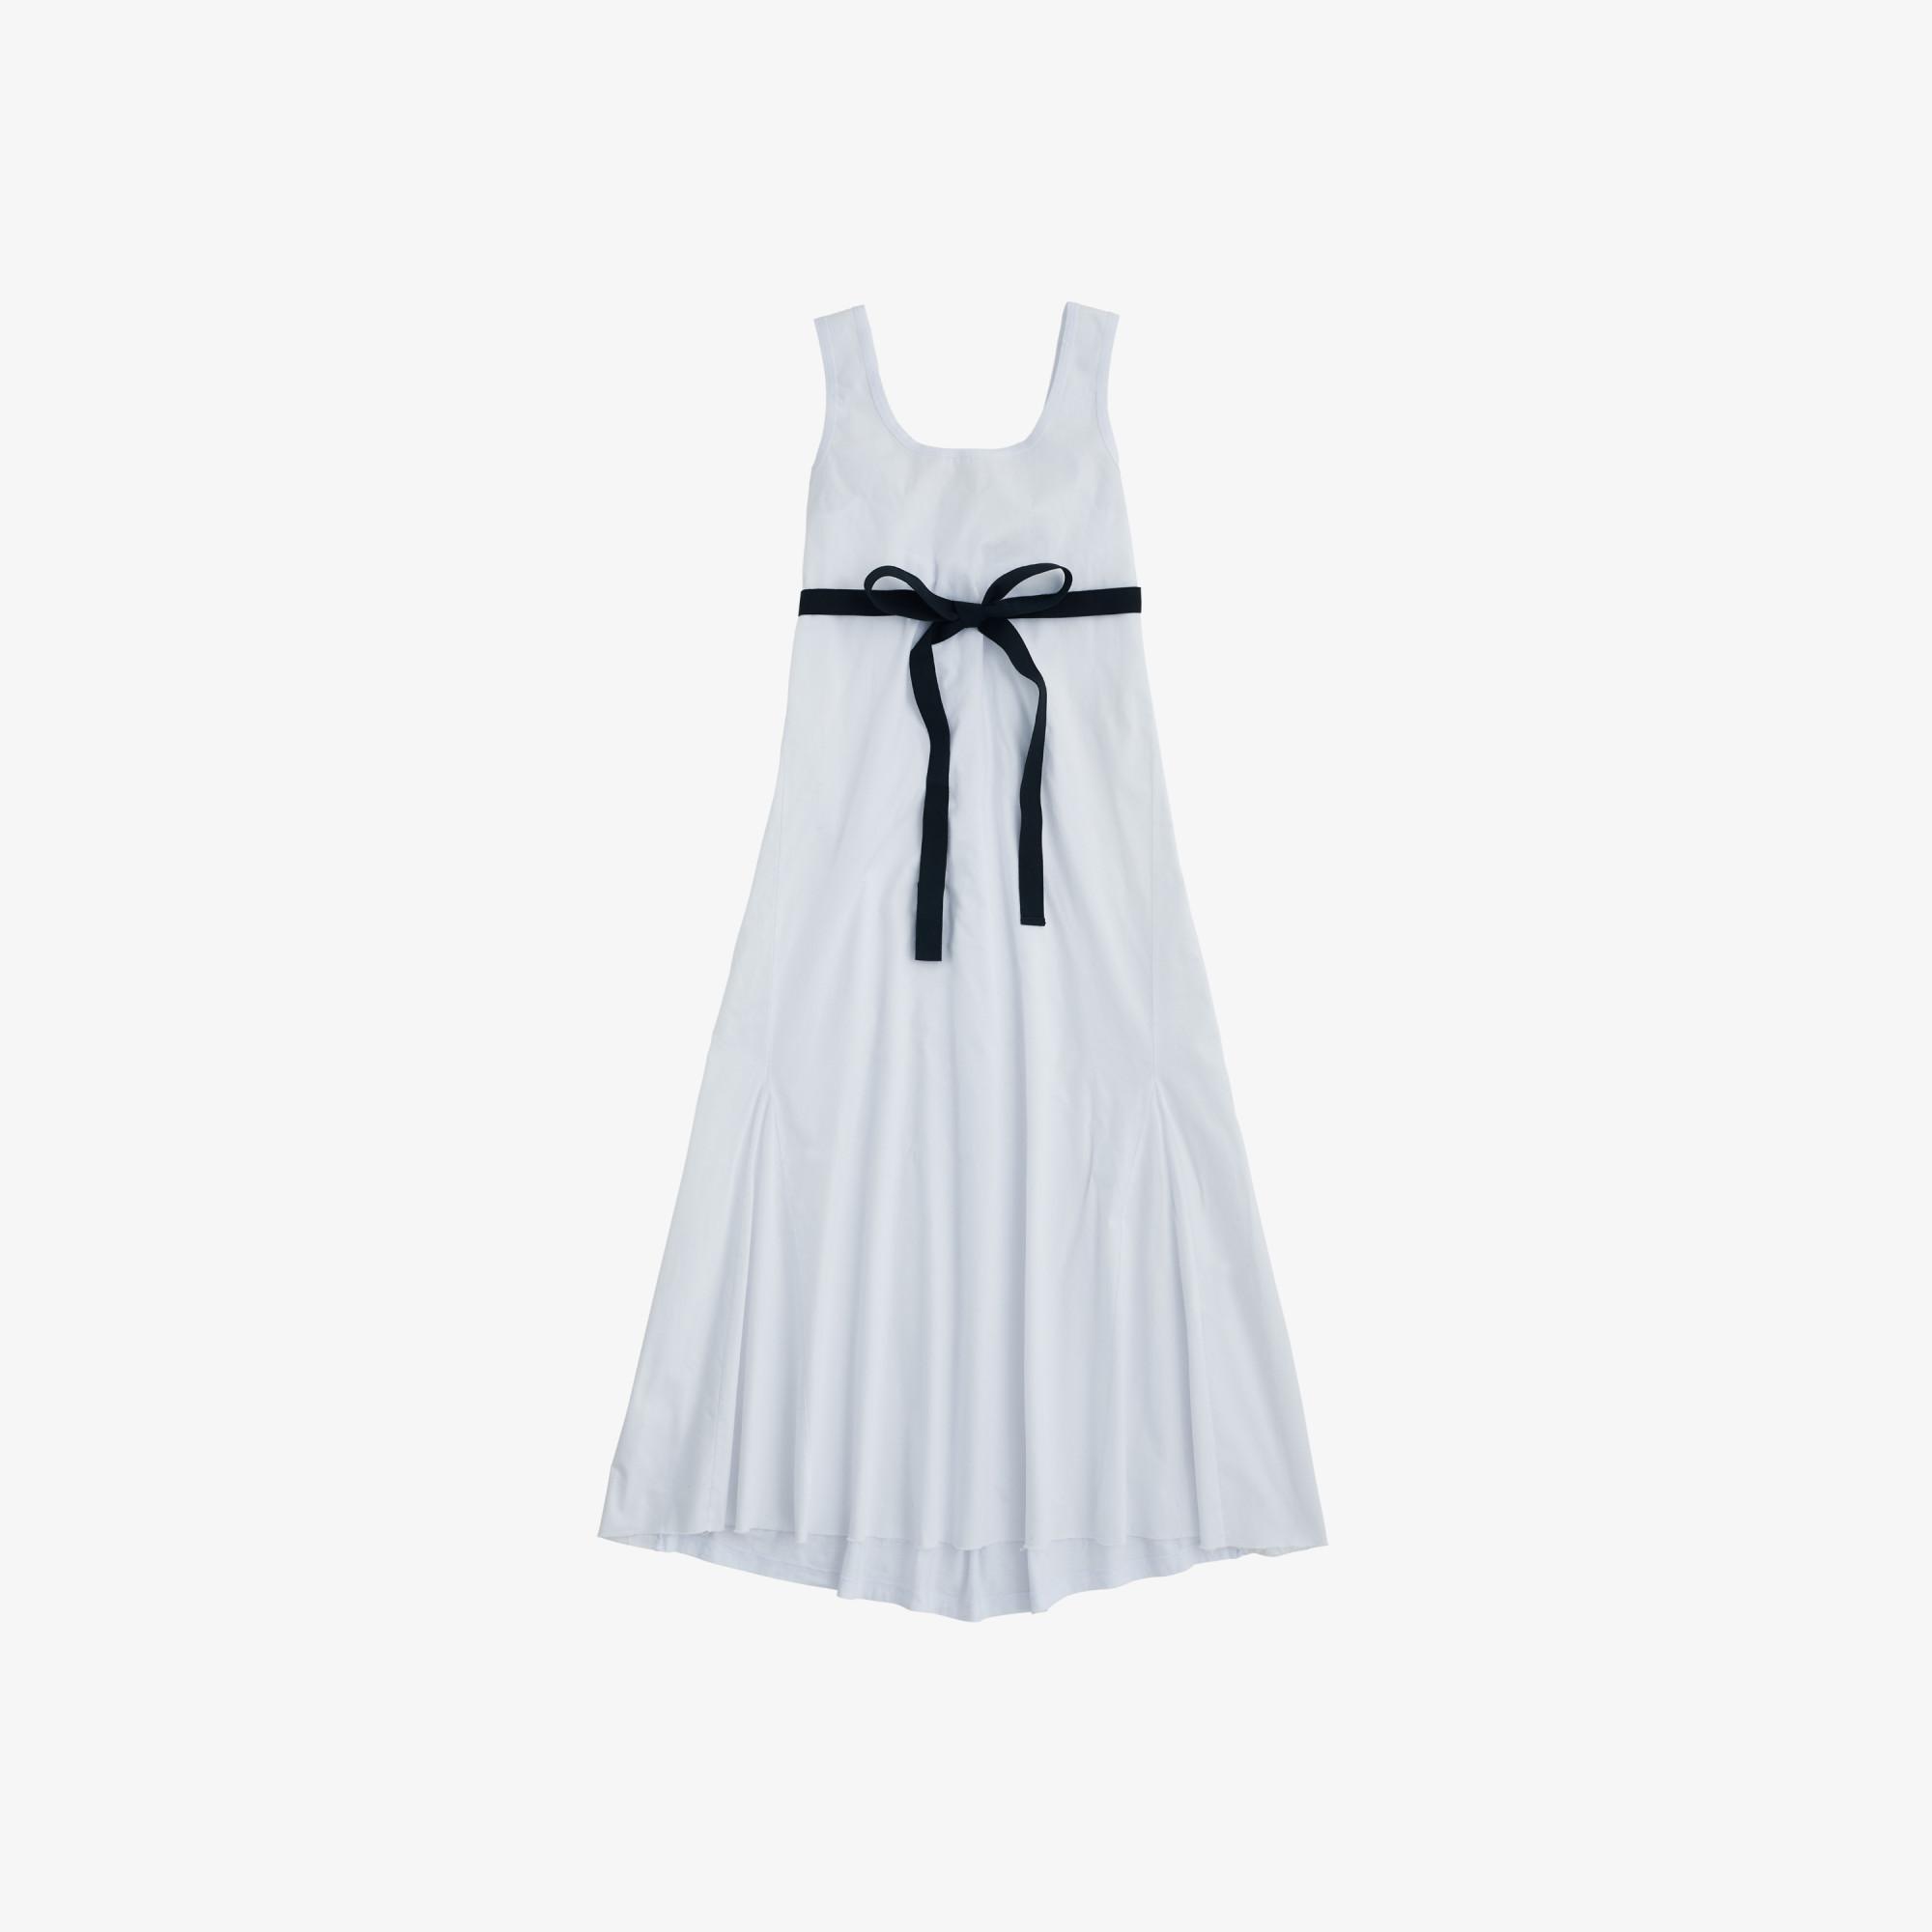 DRESS BI-FABRIC NO SLV WHITE